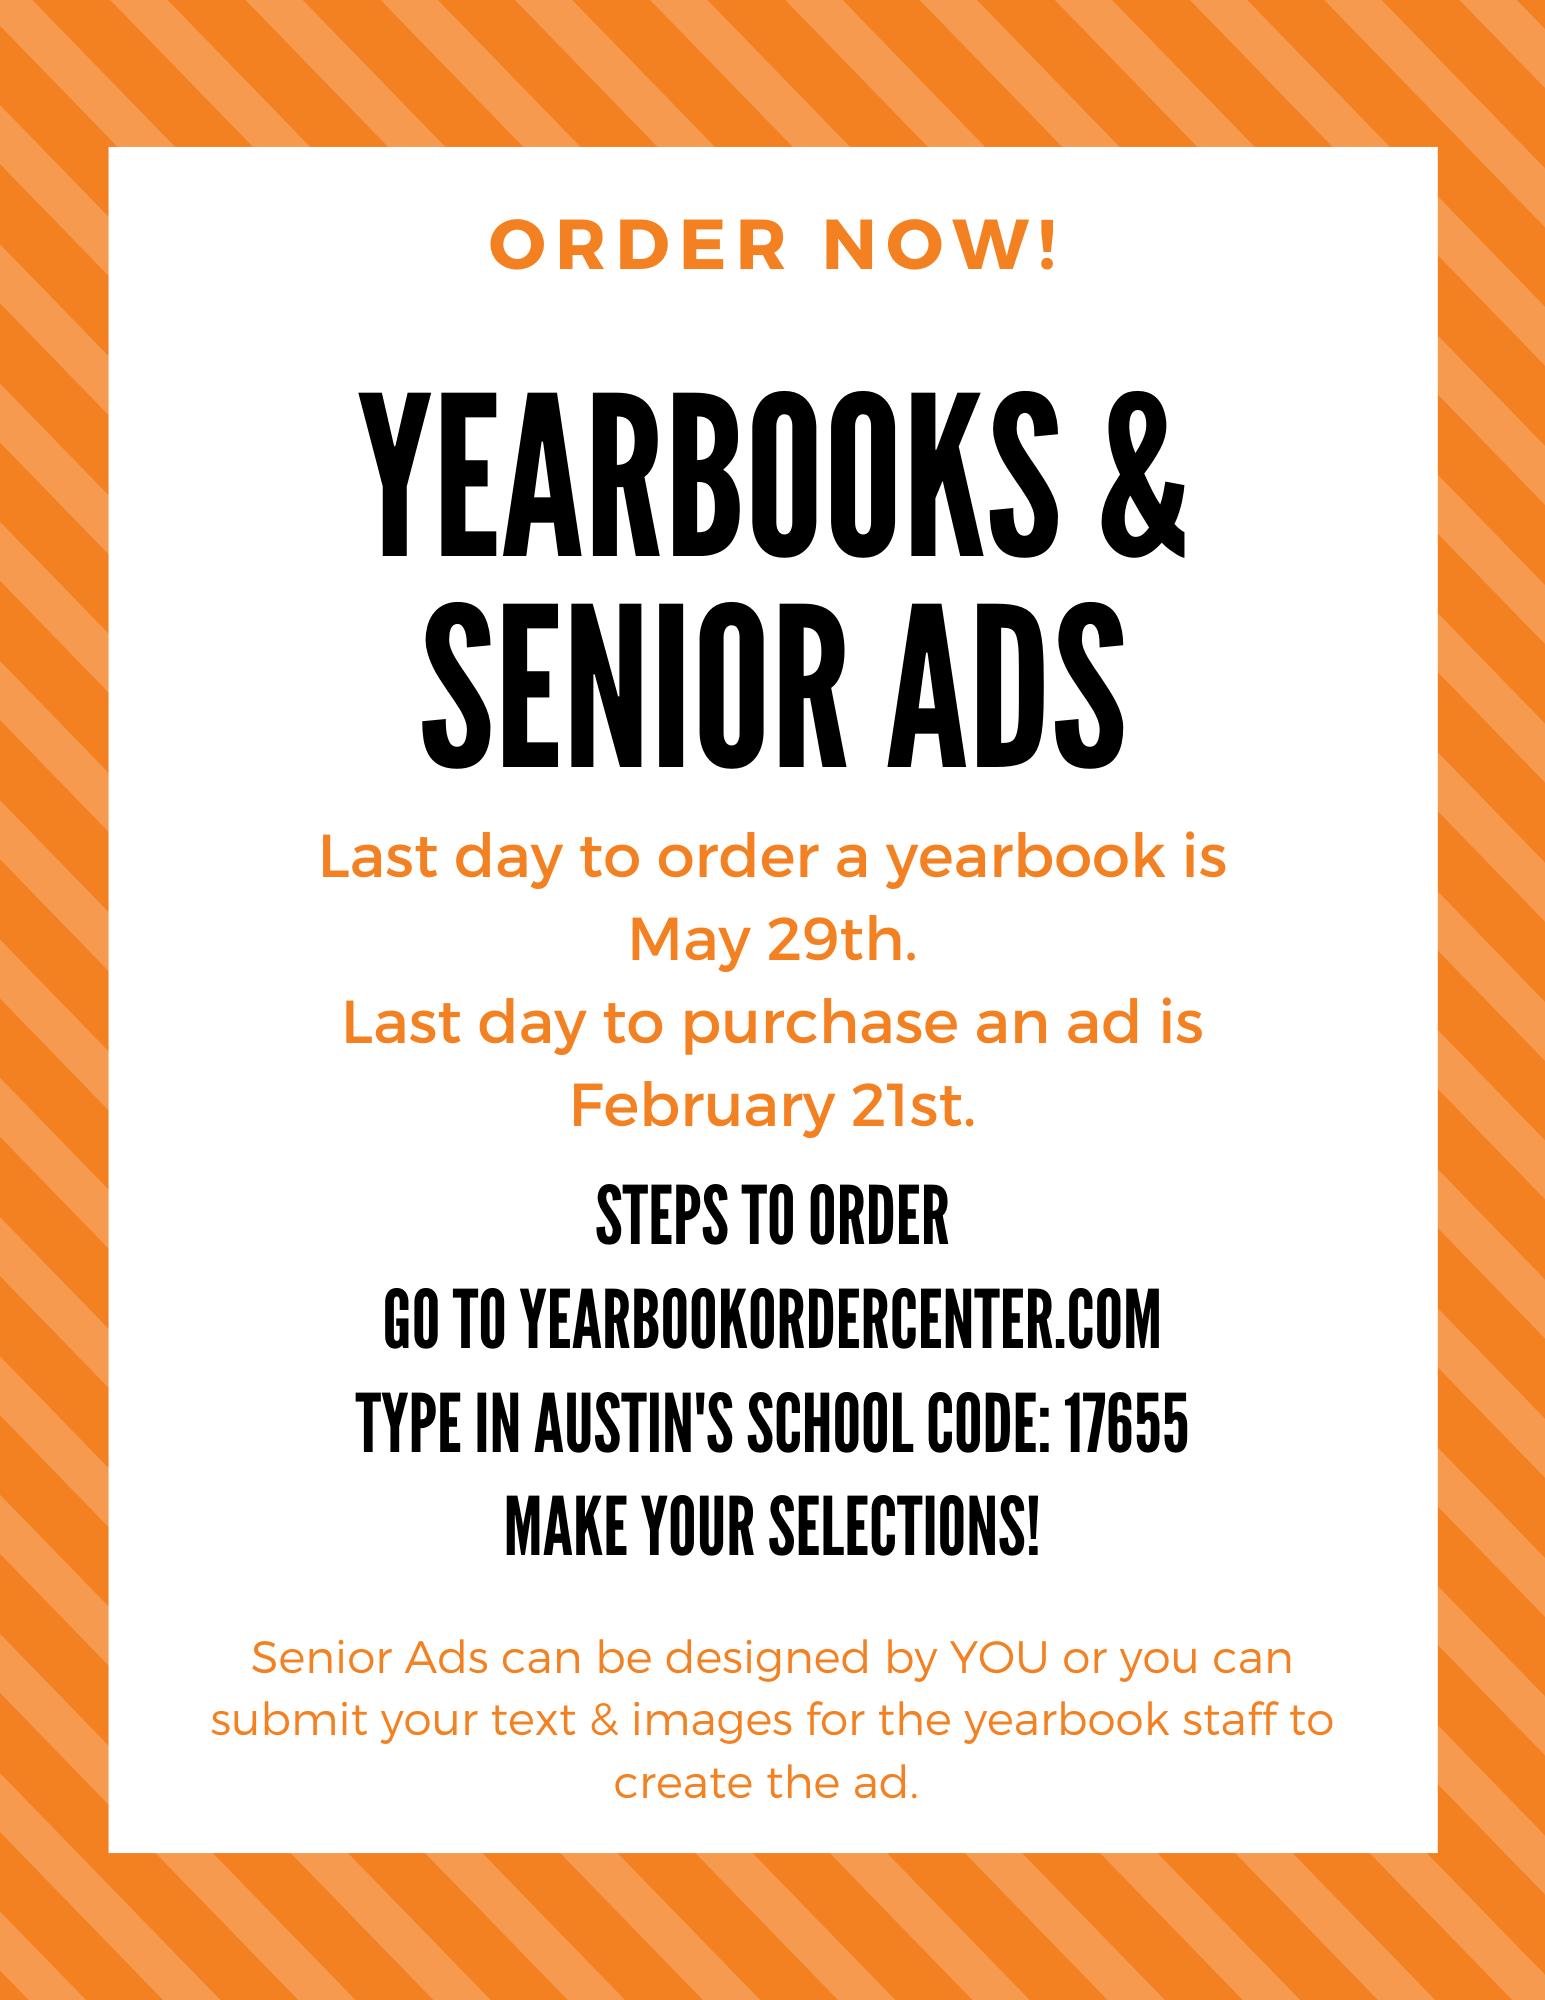 2020 Yearbooks and Senior Ads Image